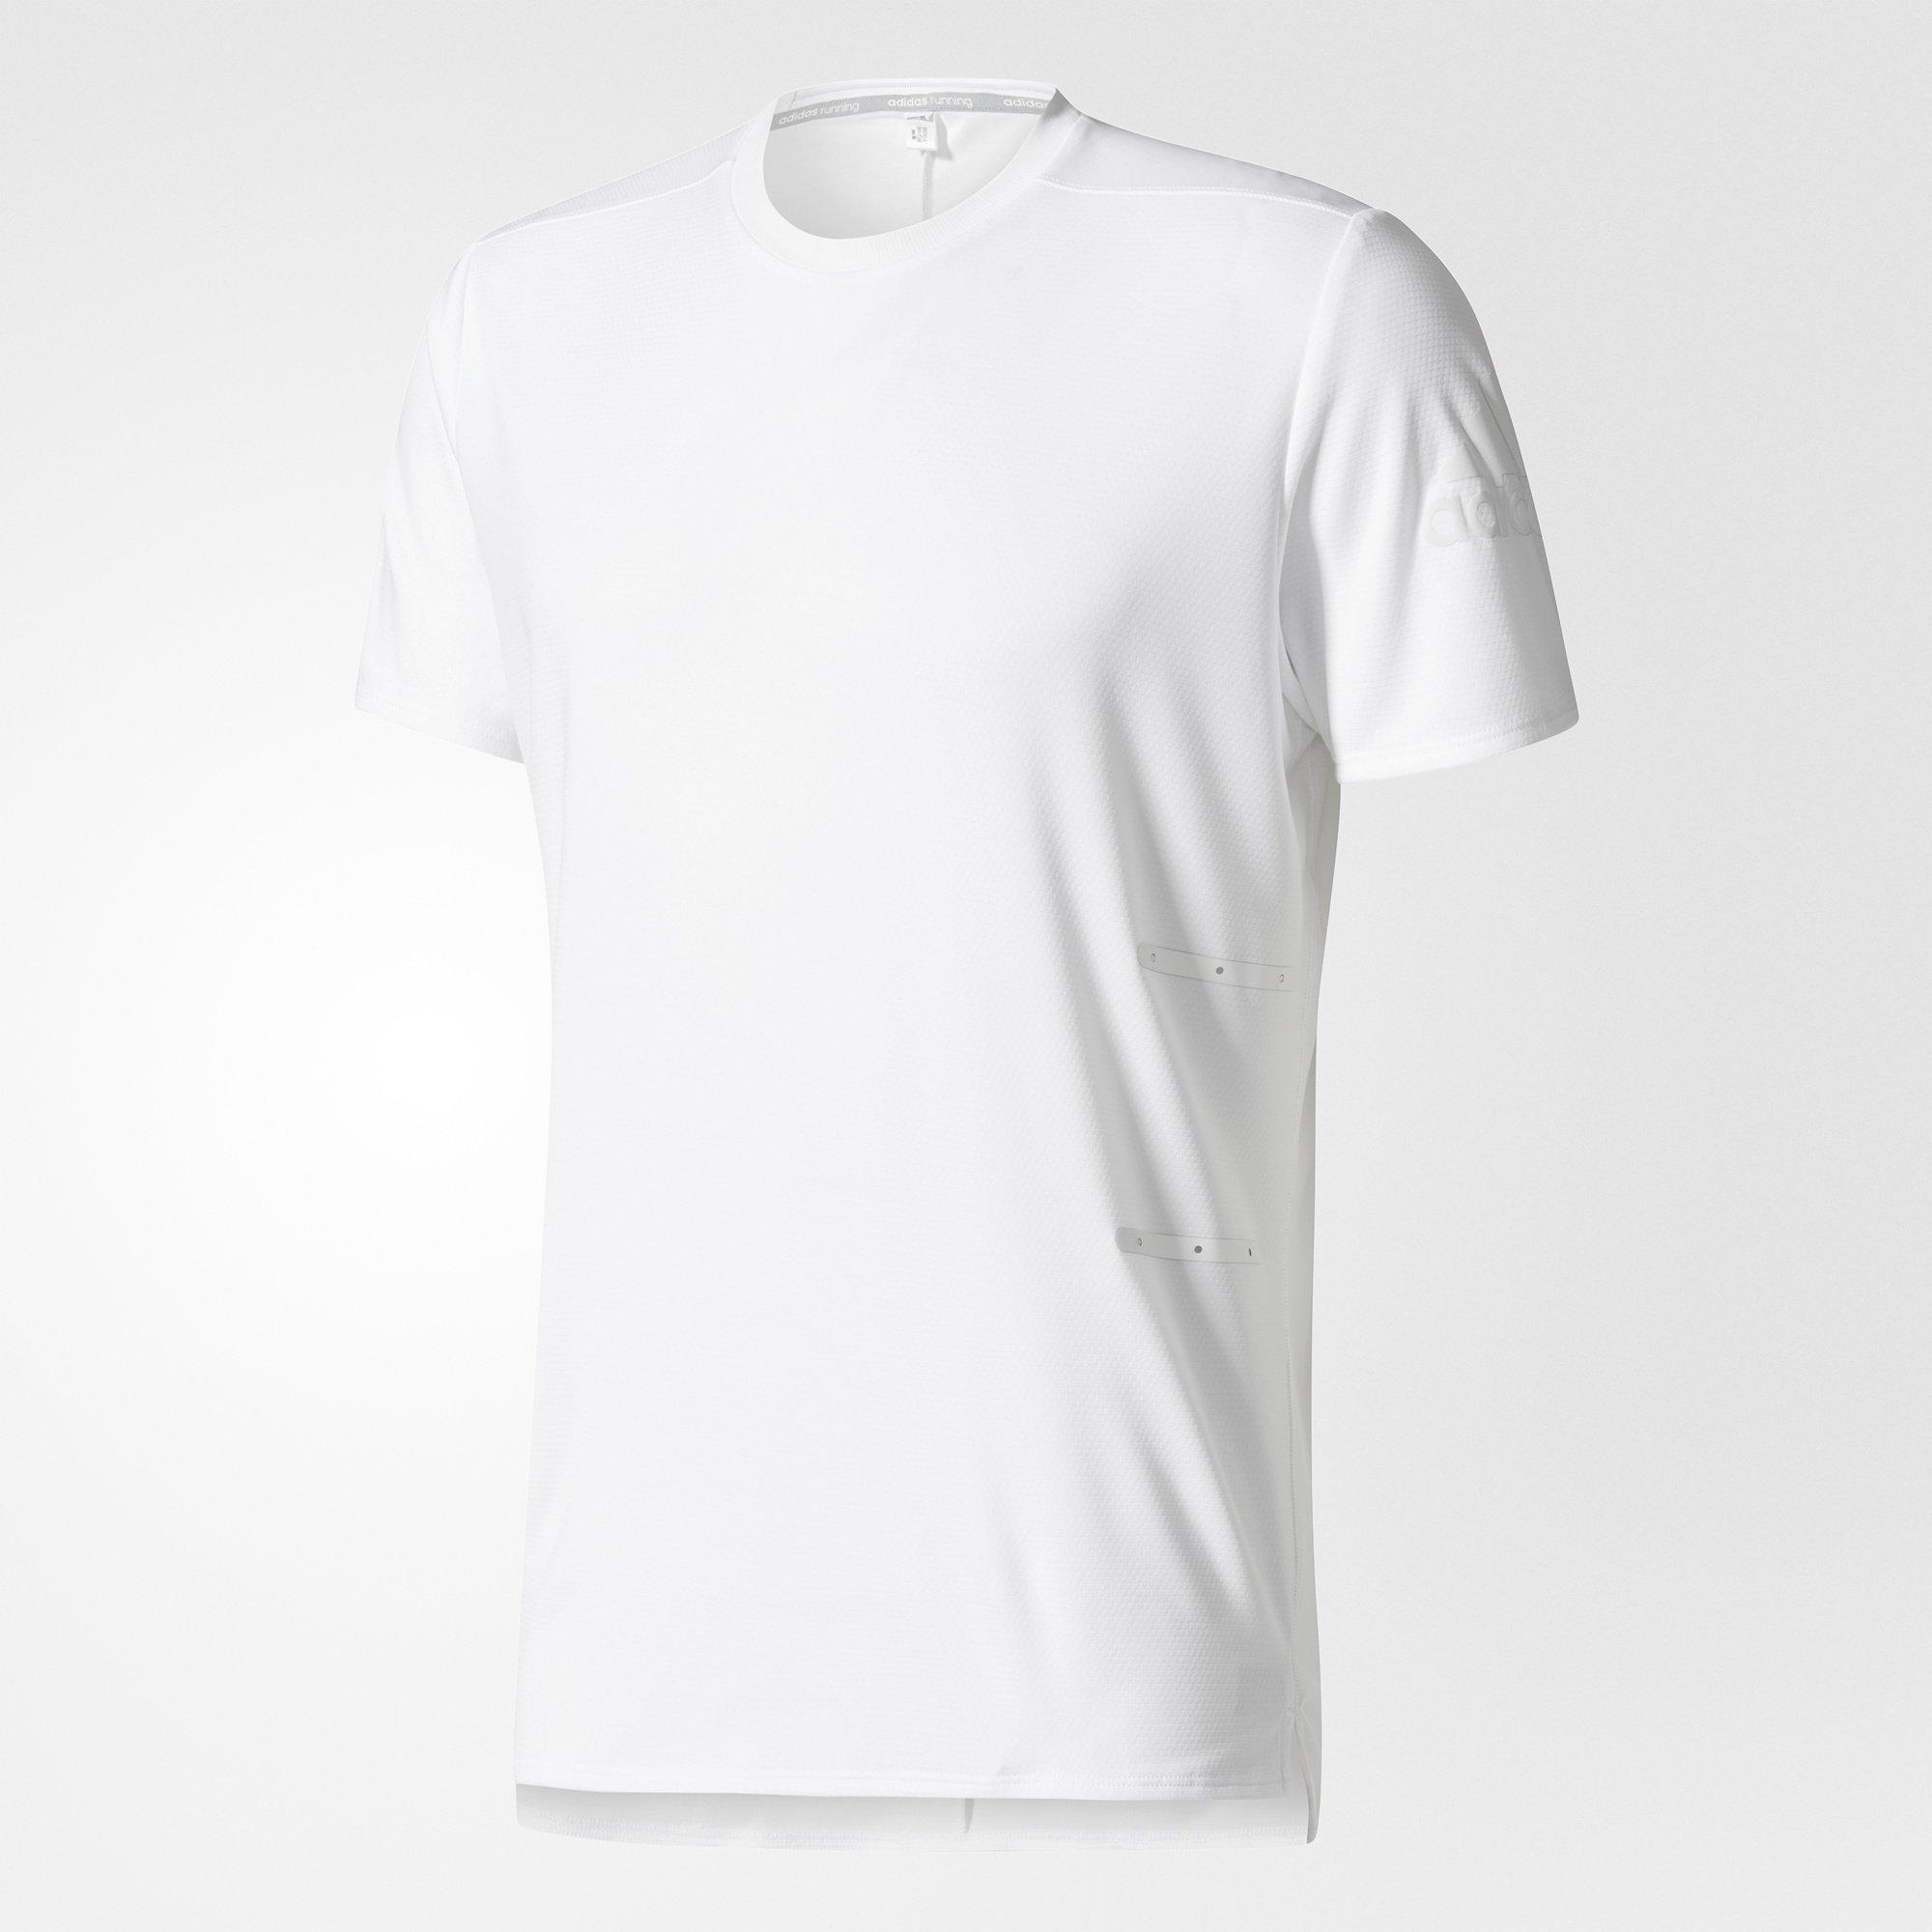 Мужская футболка Adidas Supernova 37C SS BQ2199 44-46 RU